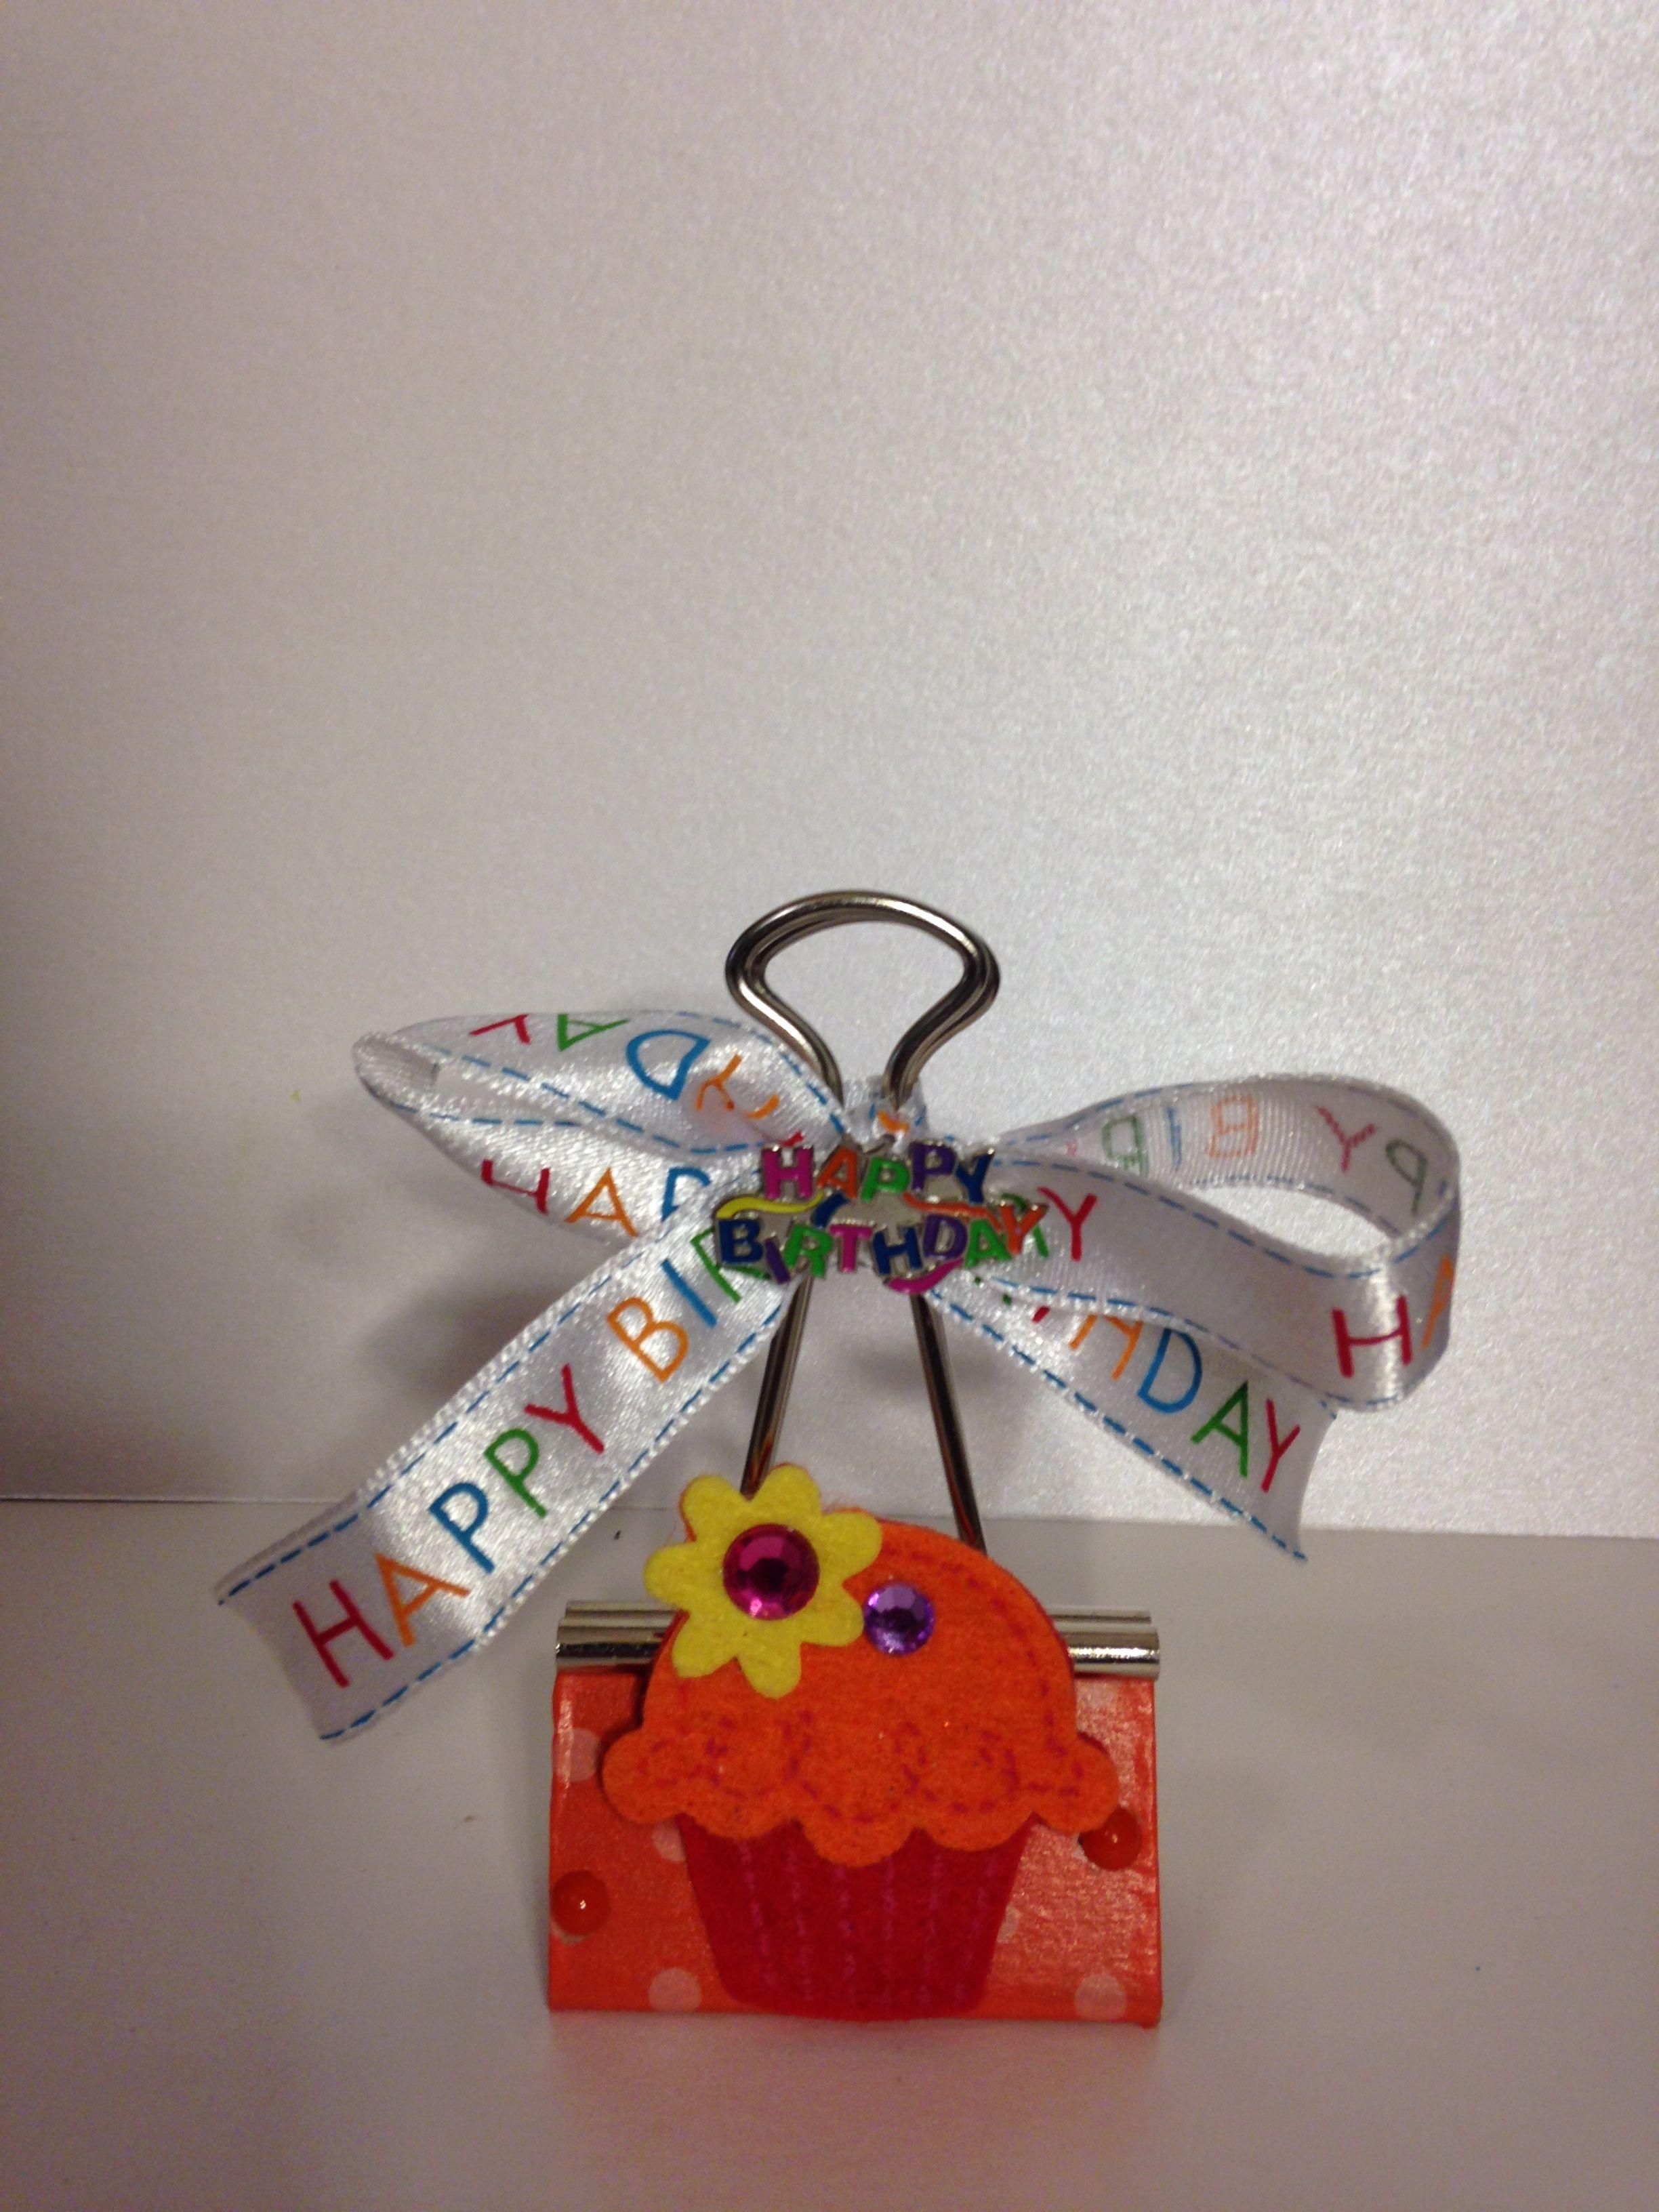 BINDER CLIP DECORATION Bazaar crafts, Paper clips diy